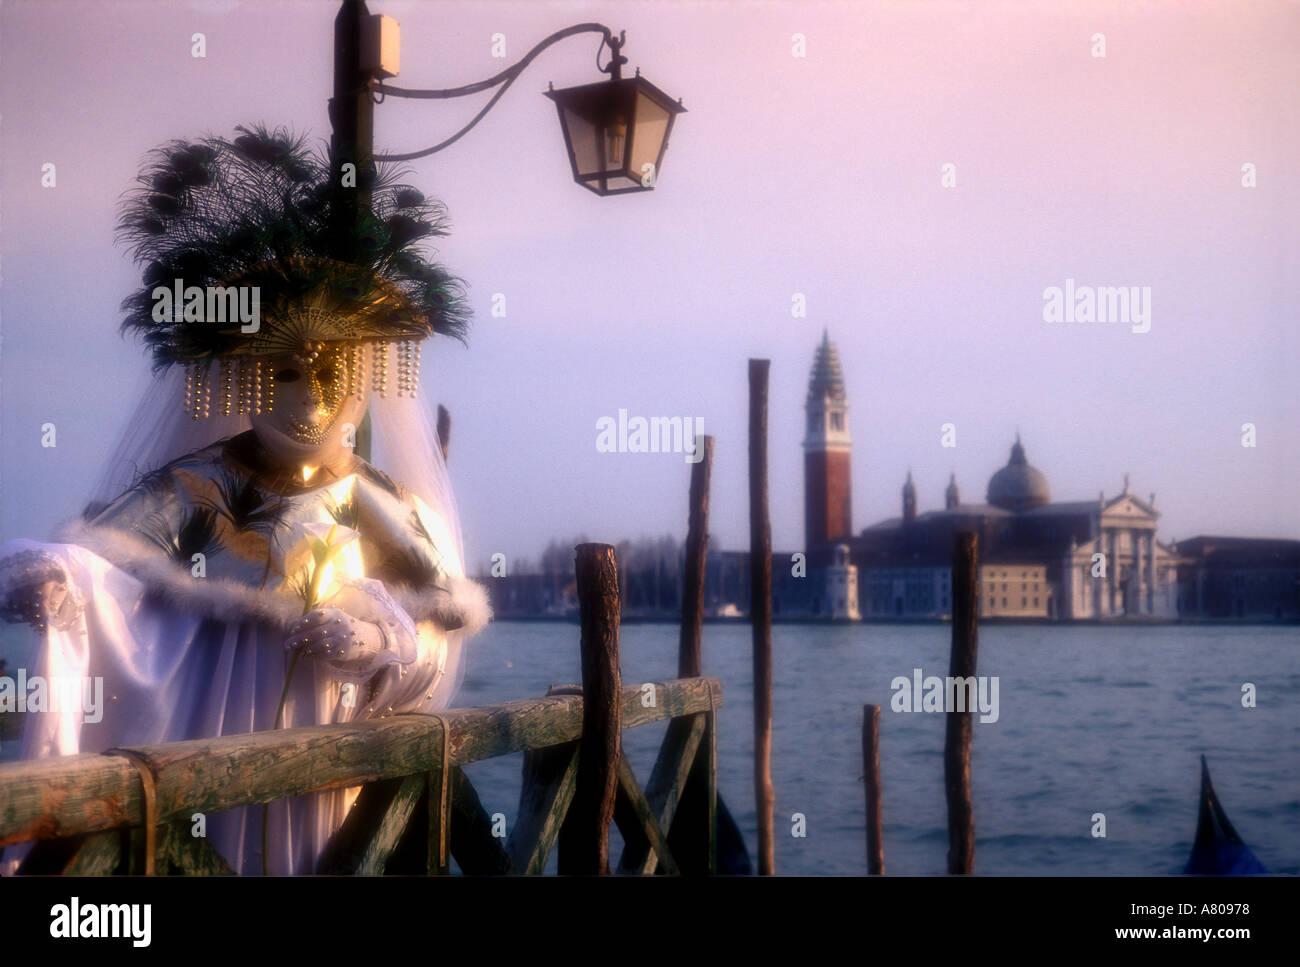 Carnival goer in Oriental costume at the annual Venice carnival Italy - Stock Image